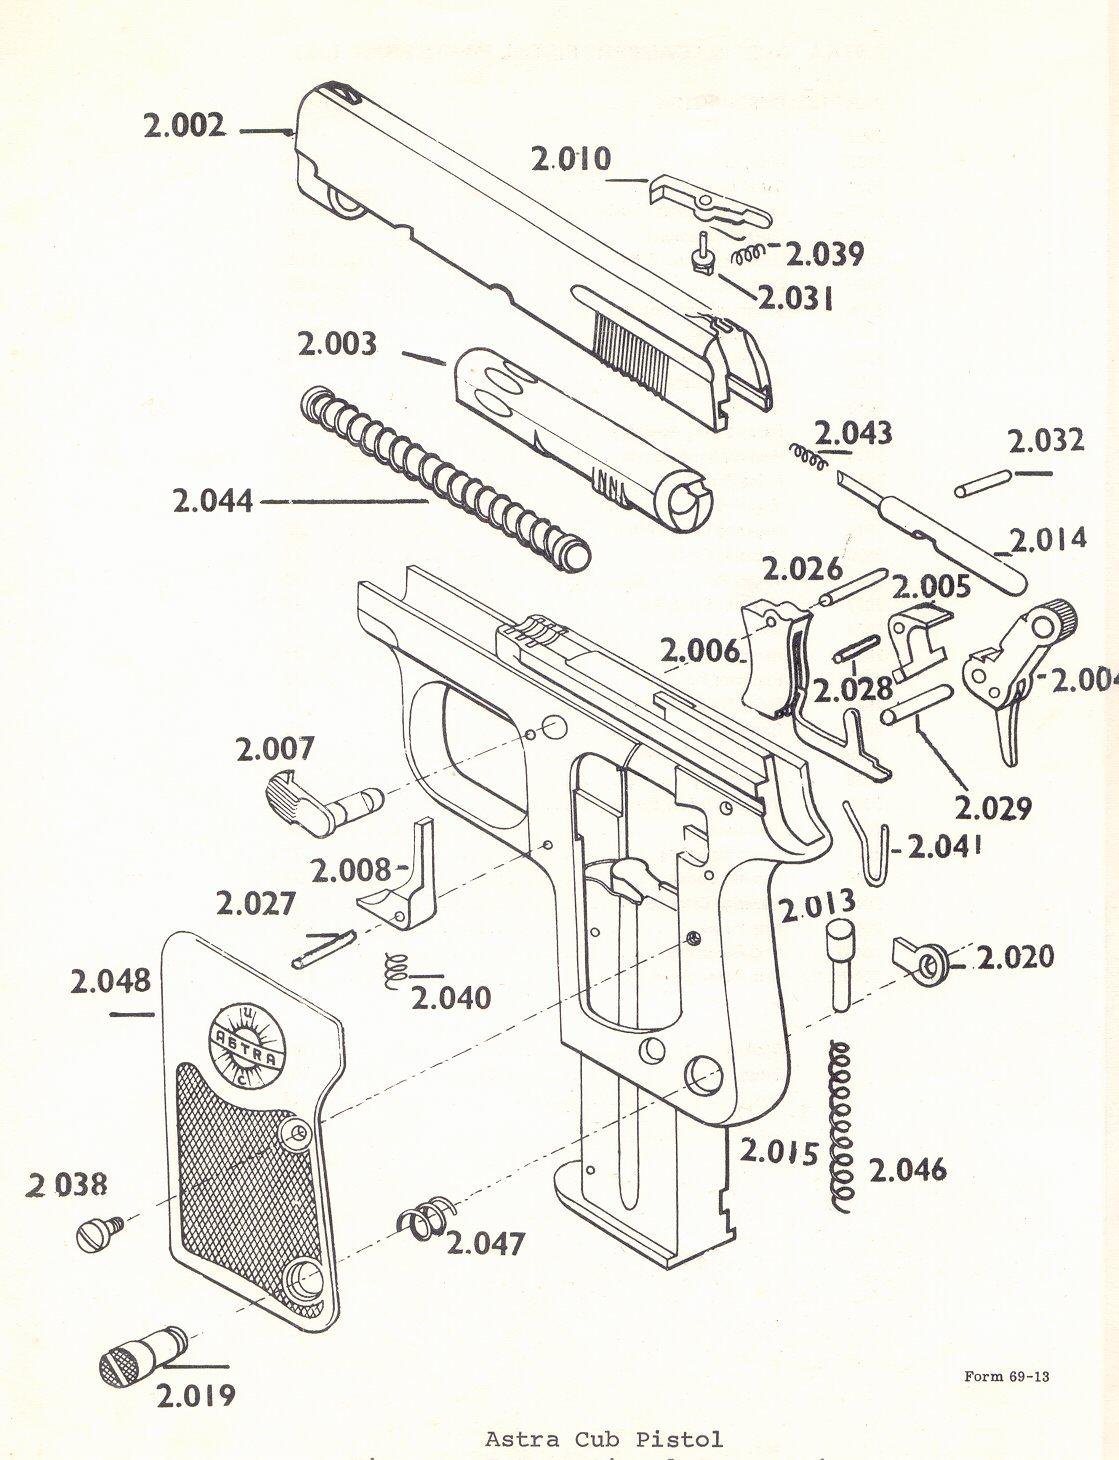 All Avaialble Astra Gun Parts Bob S Gun Shop Millions